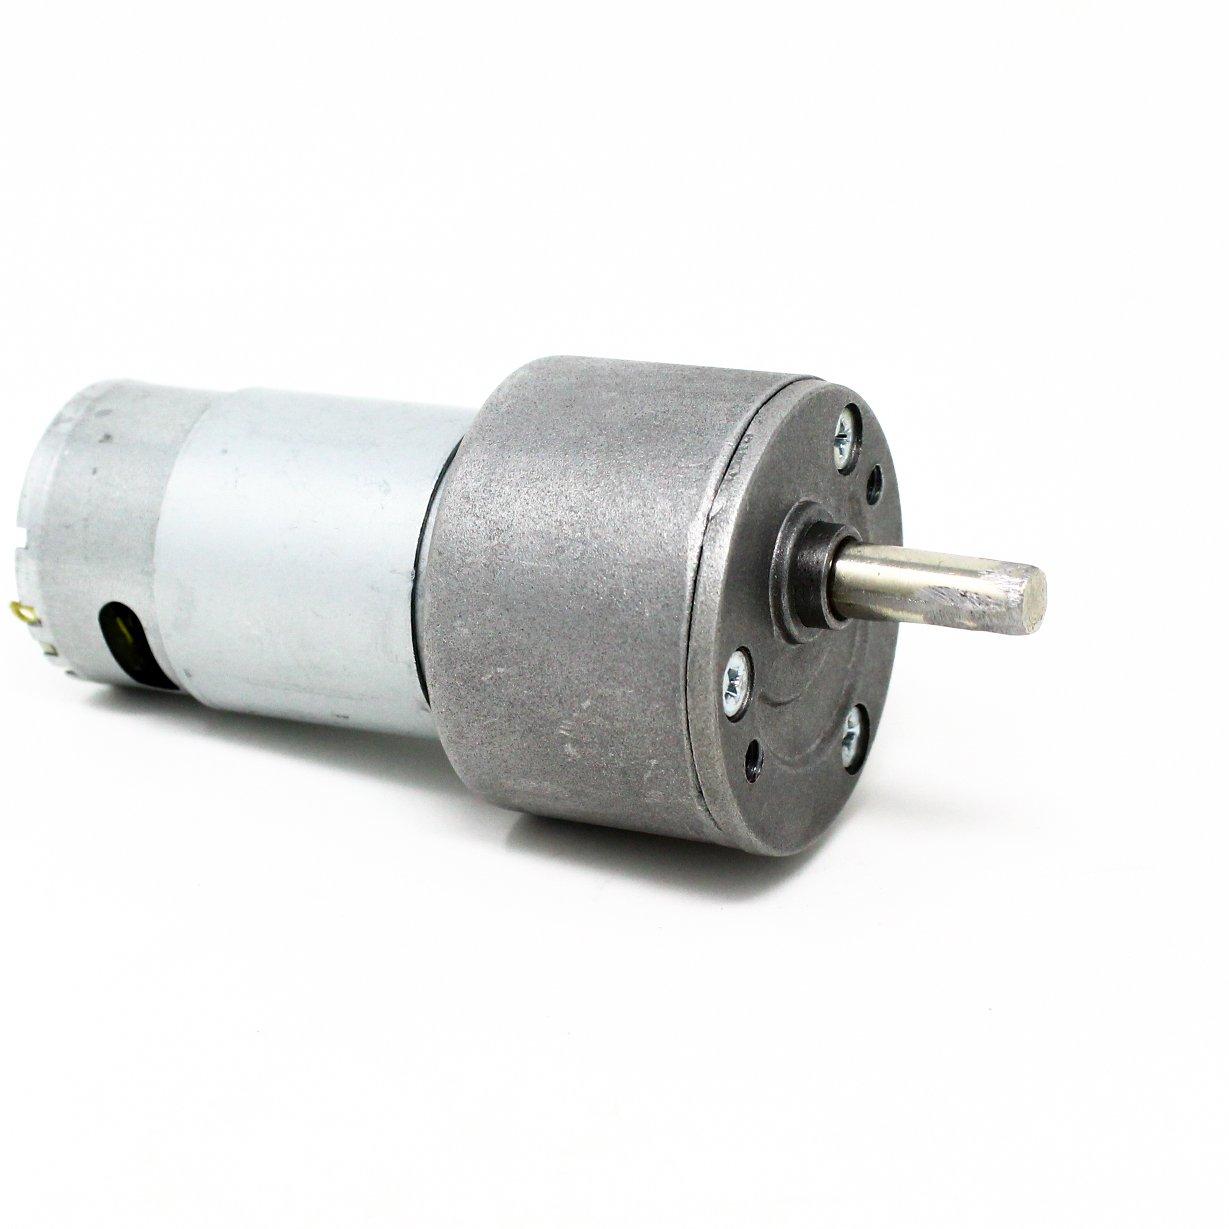 RS-50 DC Gear Motor